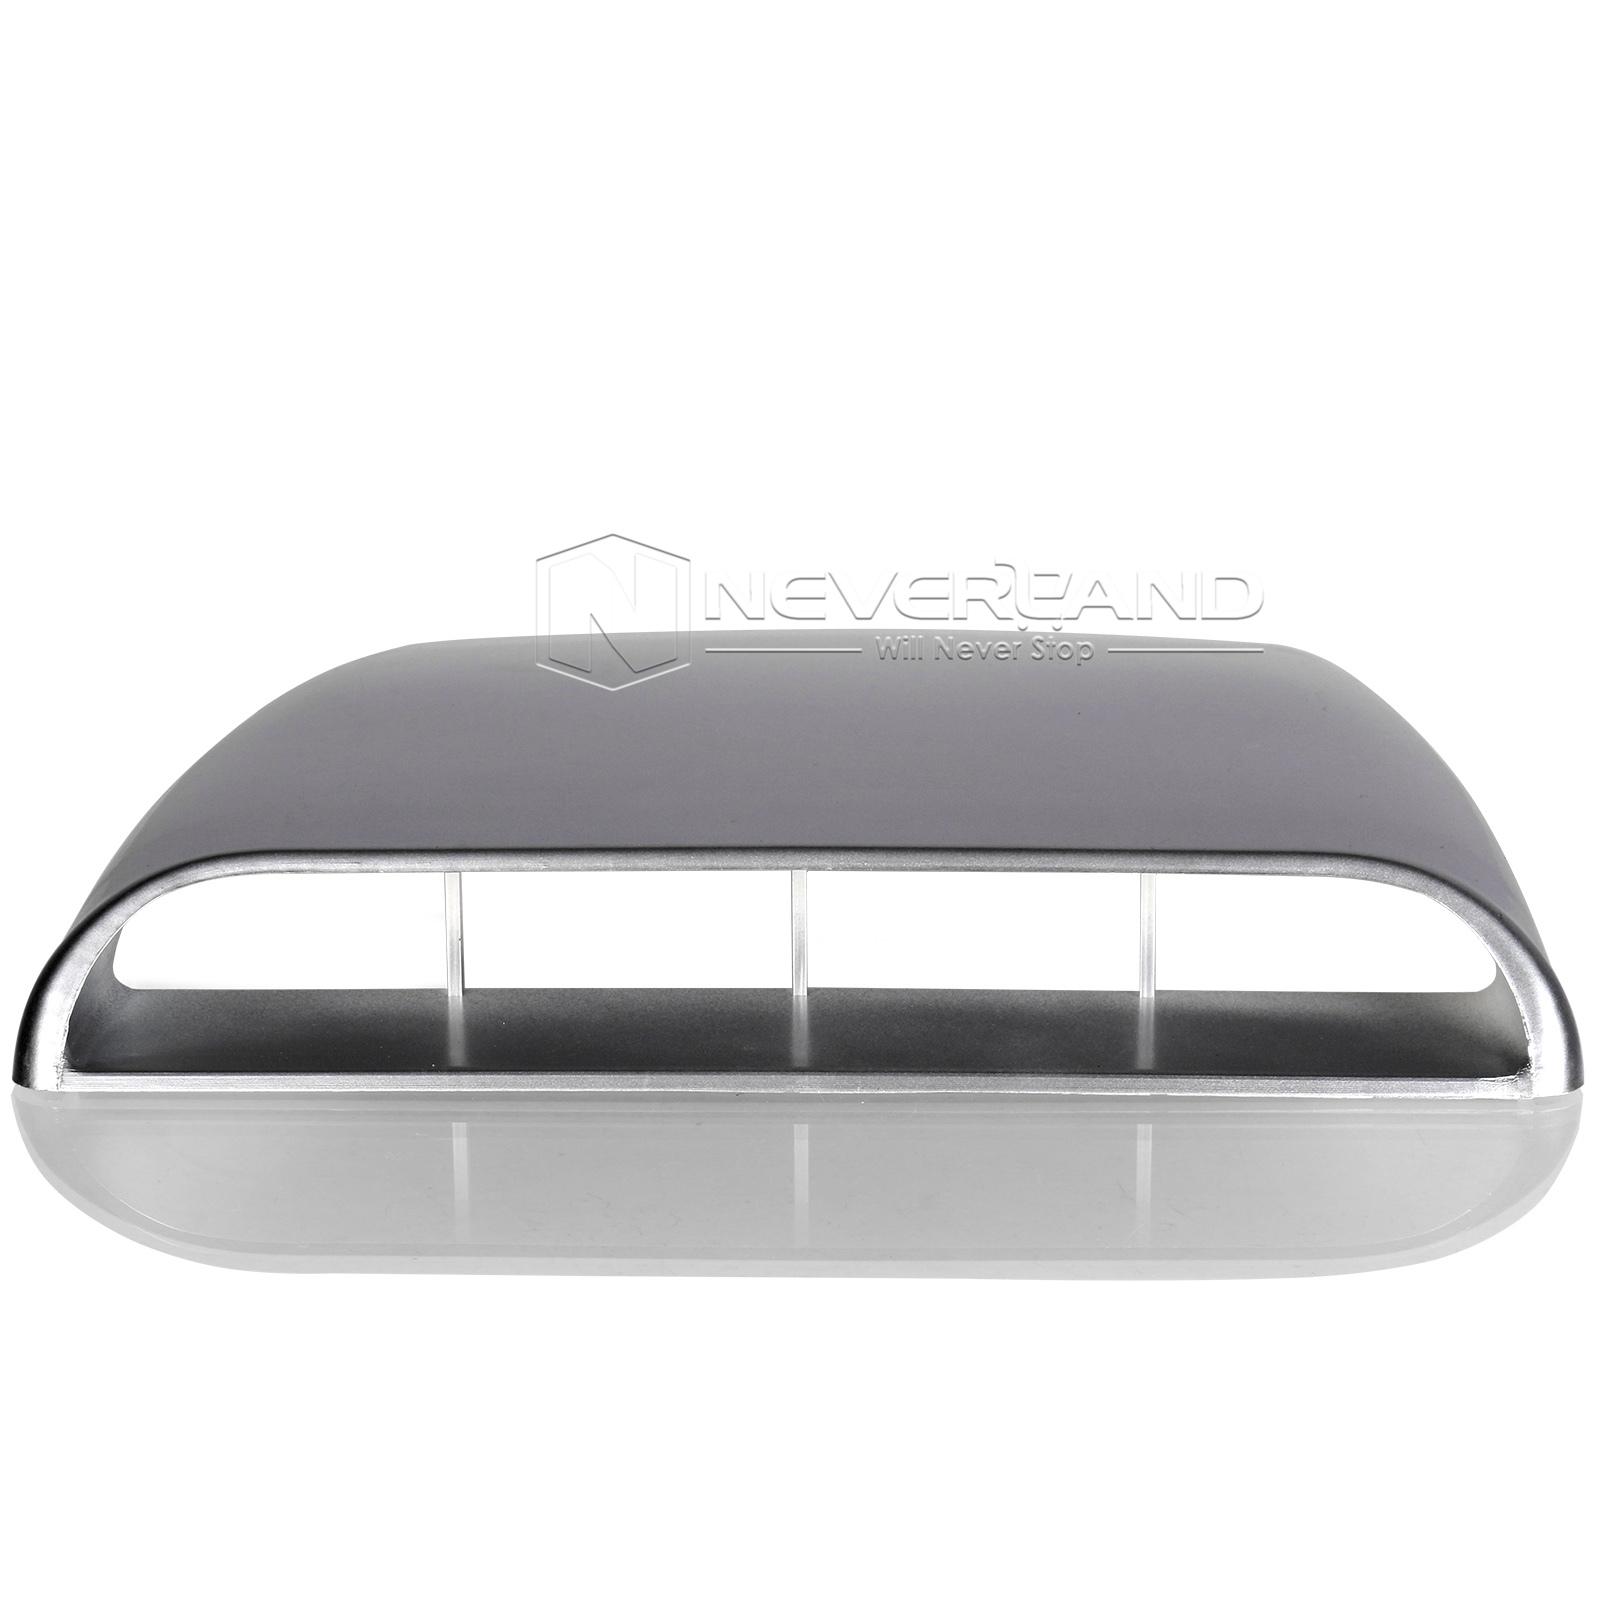 Air Scoops For Cars : Car decorative air flow intake hood scoop vent bonnet